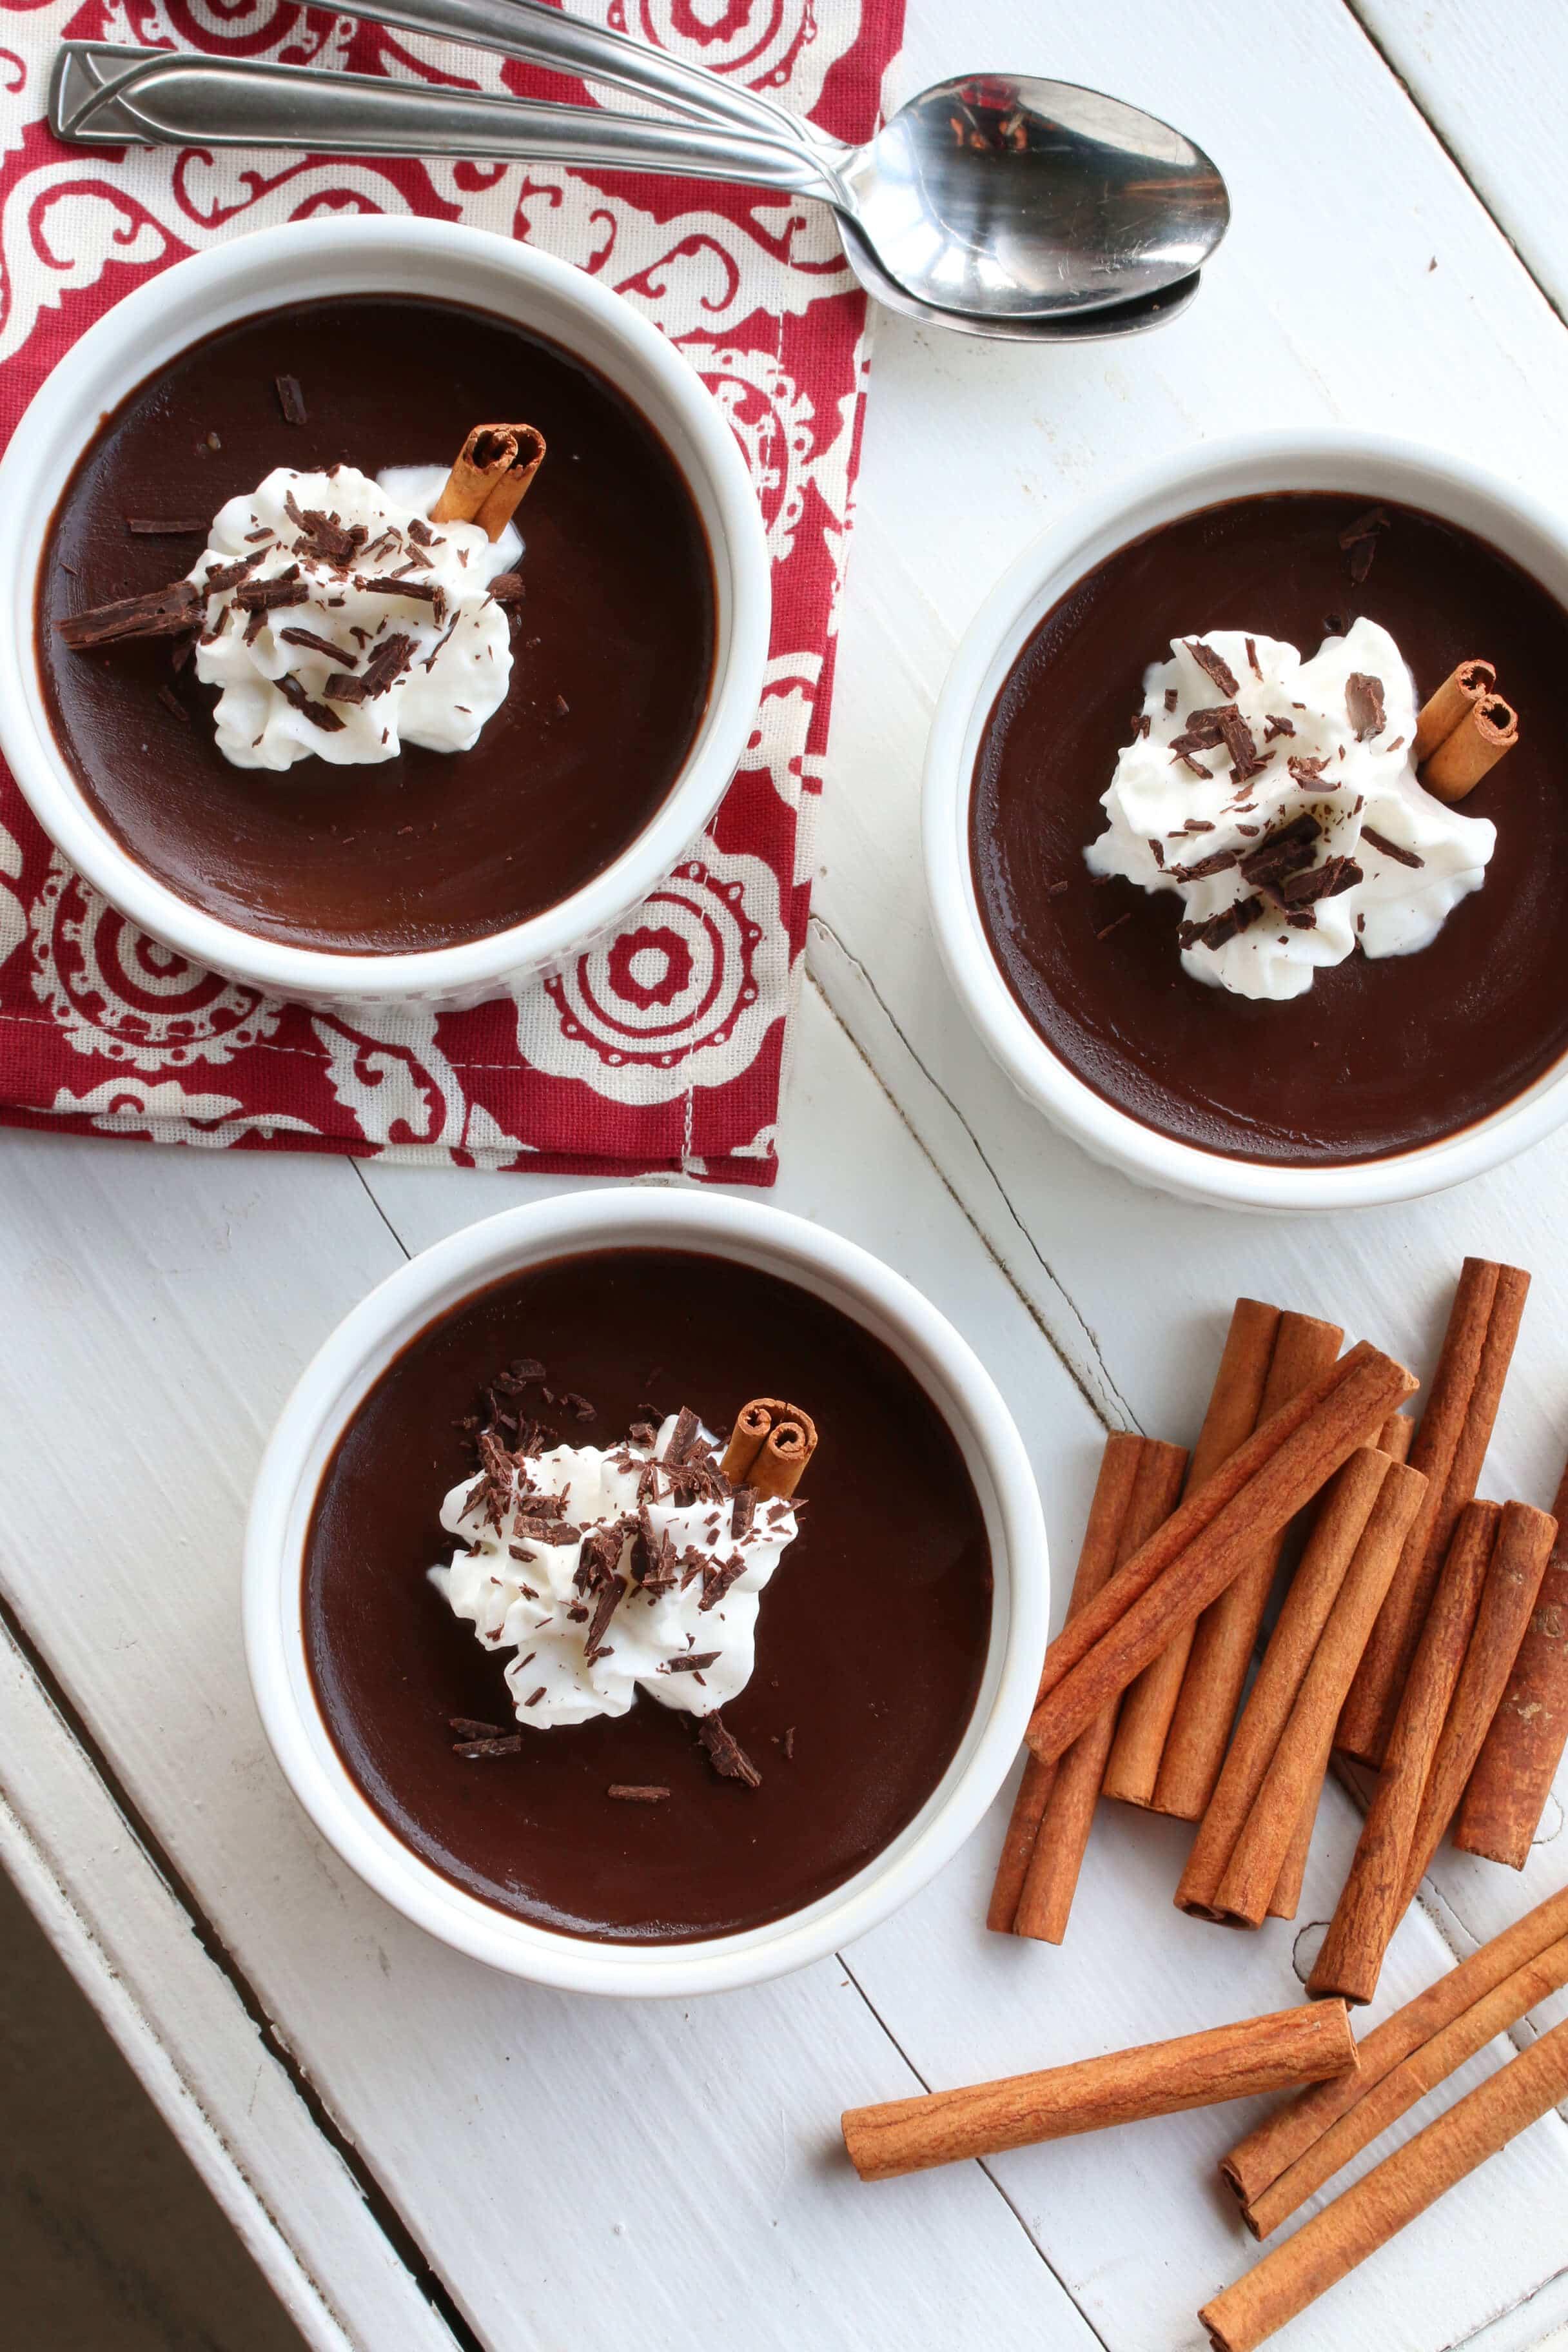 Easy Mexican Chocolate Pots de Crème - The Daring Gourmet